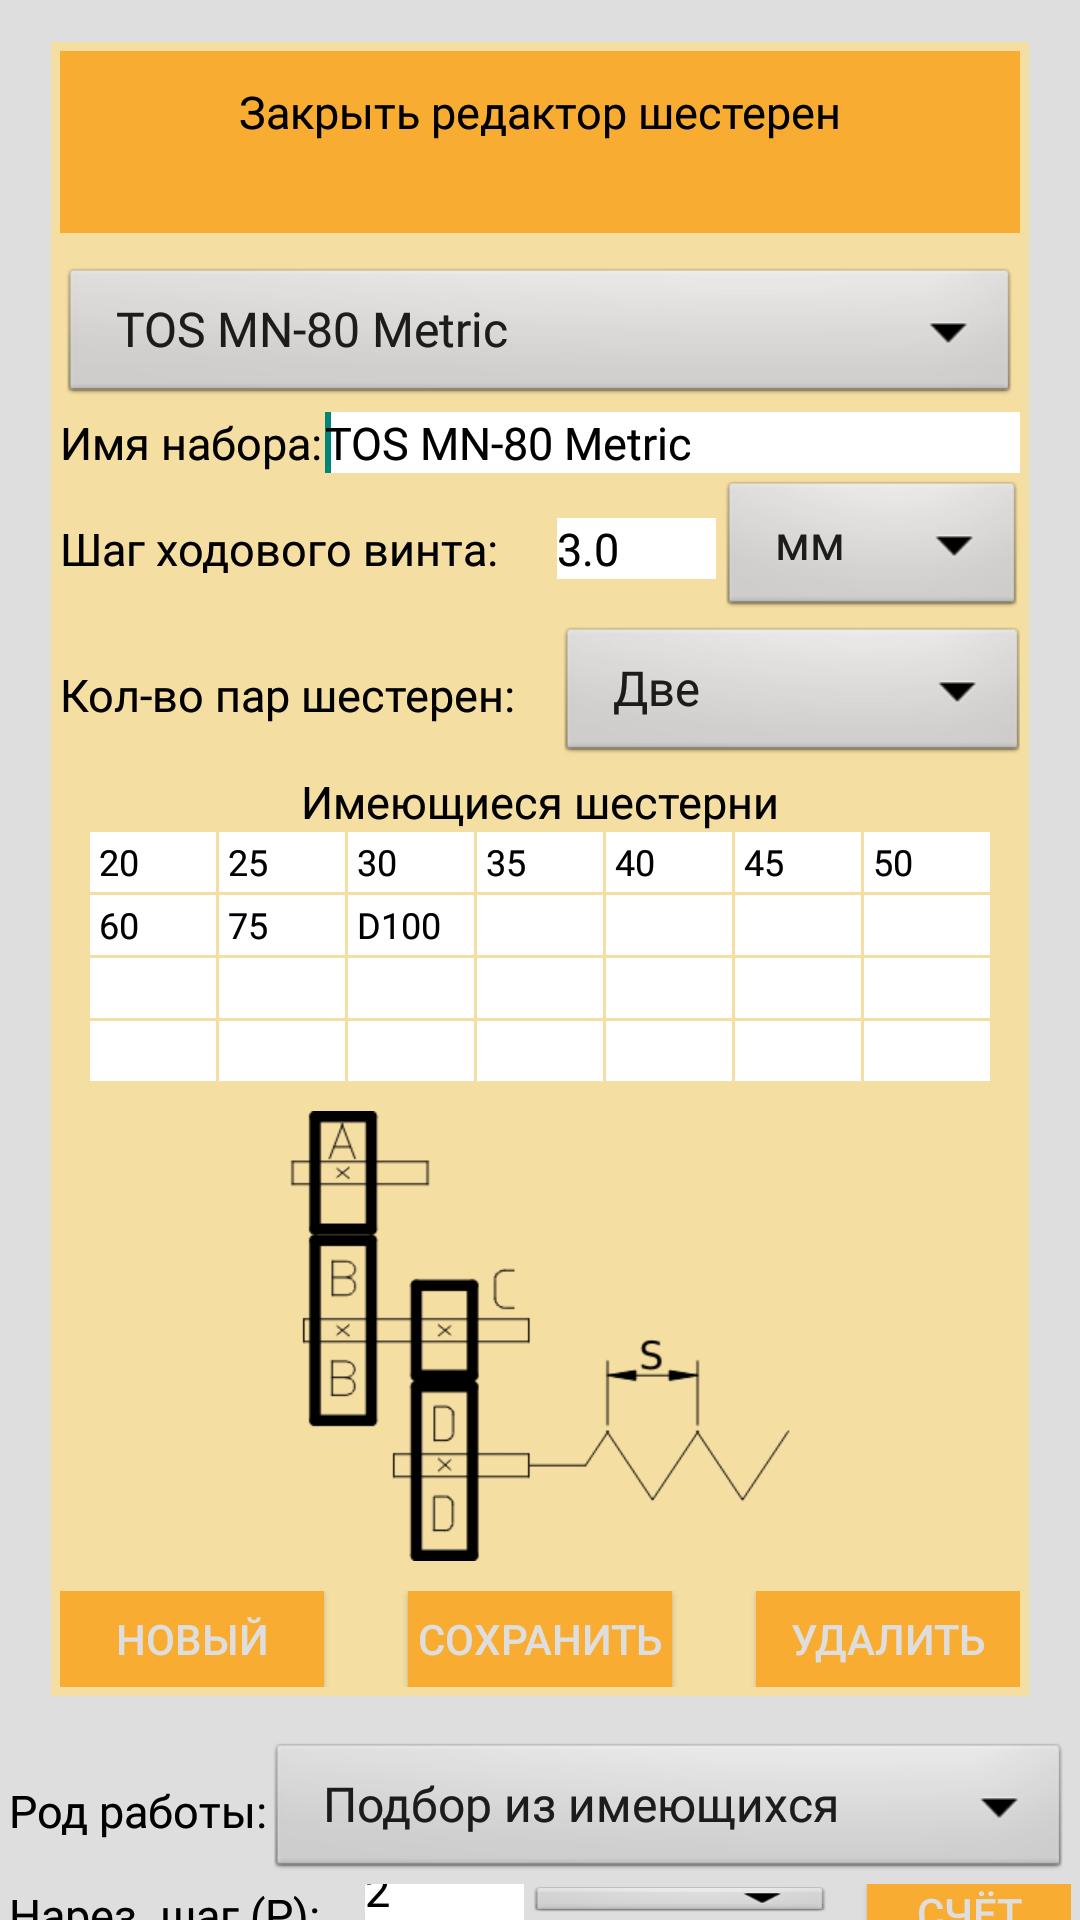 https://hot-chip.com/pics/ChipTip2/ru_gear_editor.png